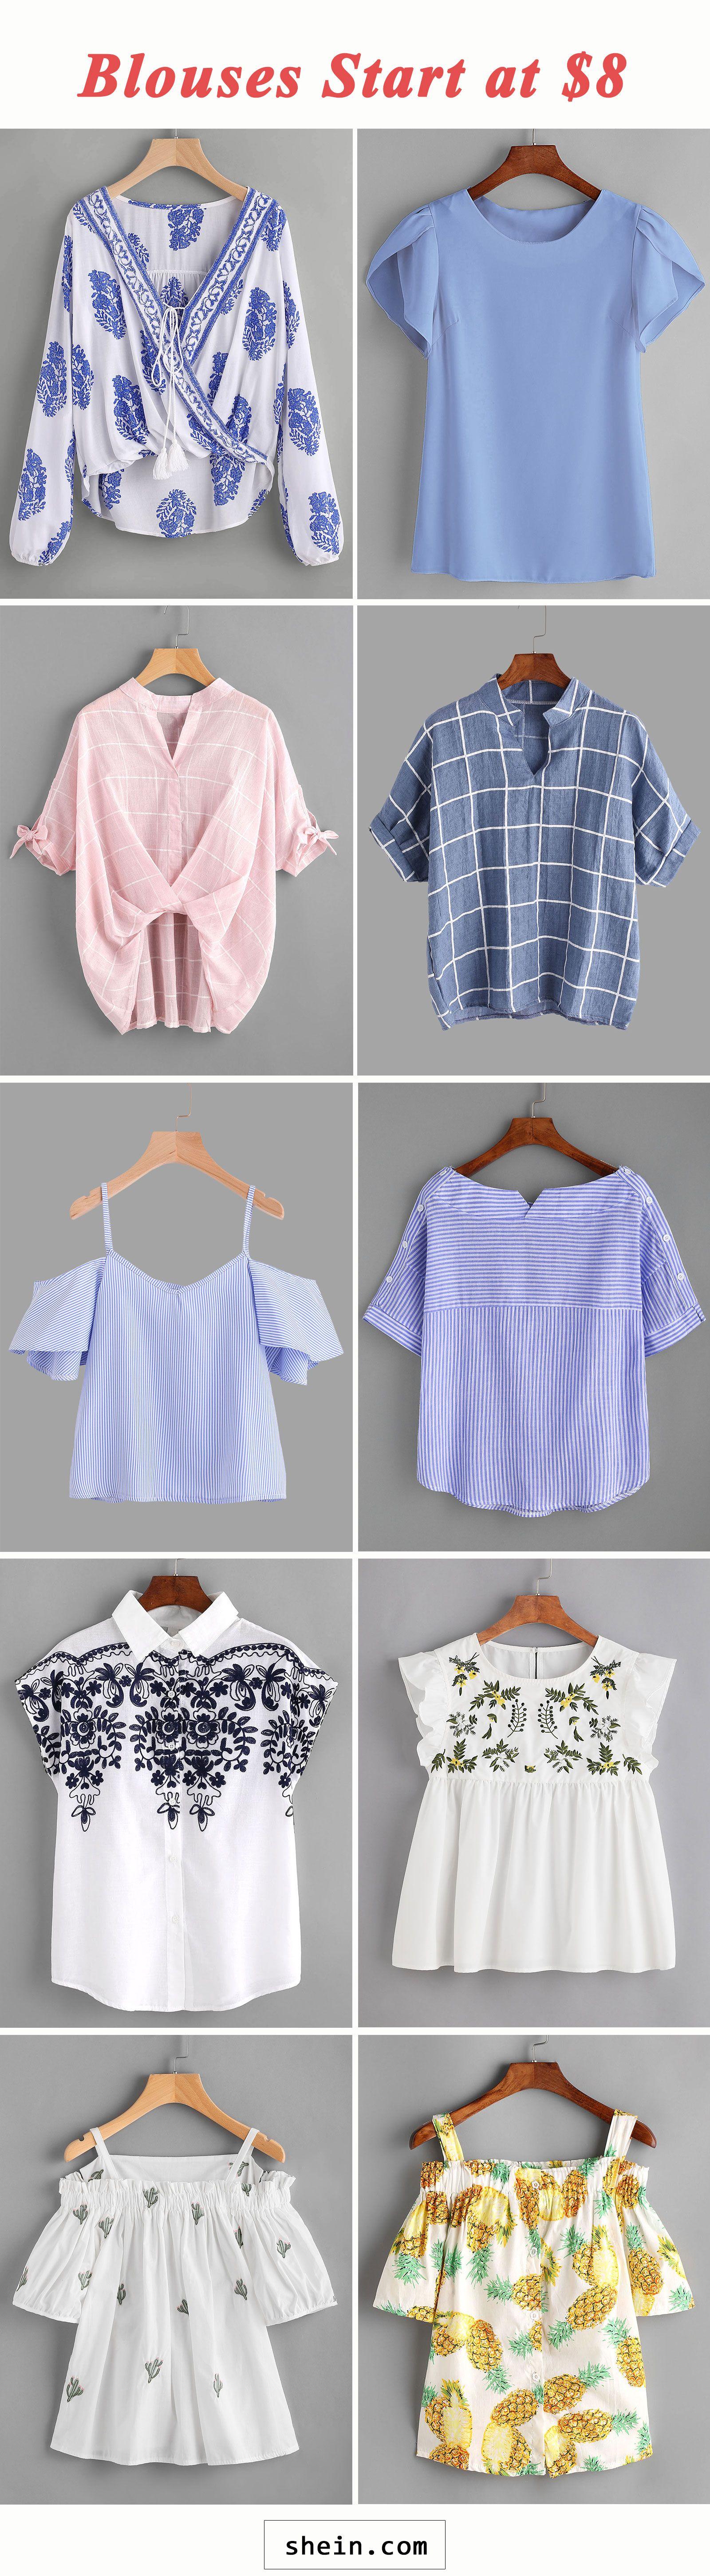 Comfy blouses start at $8